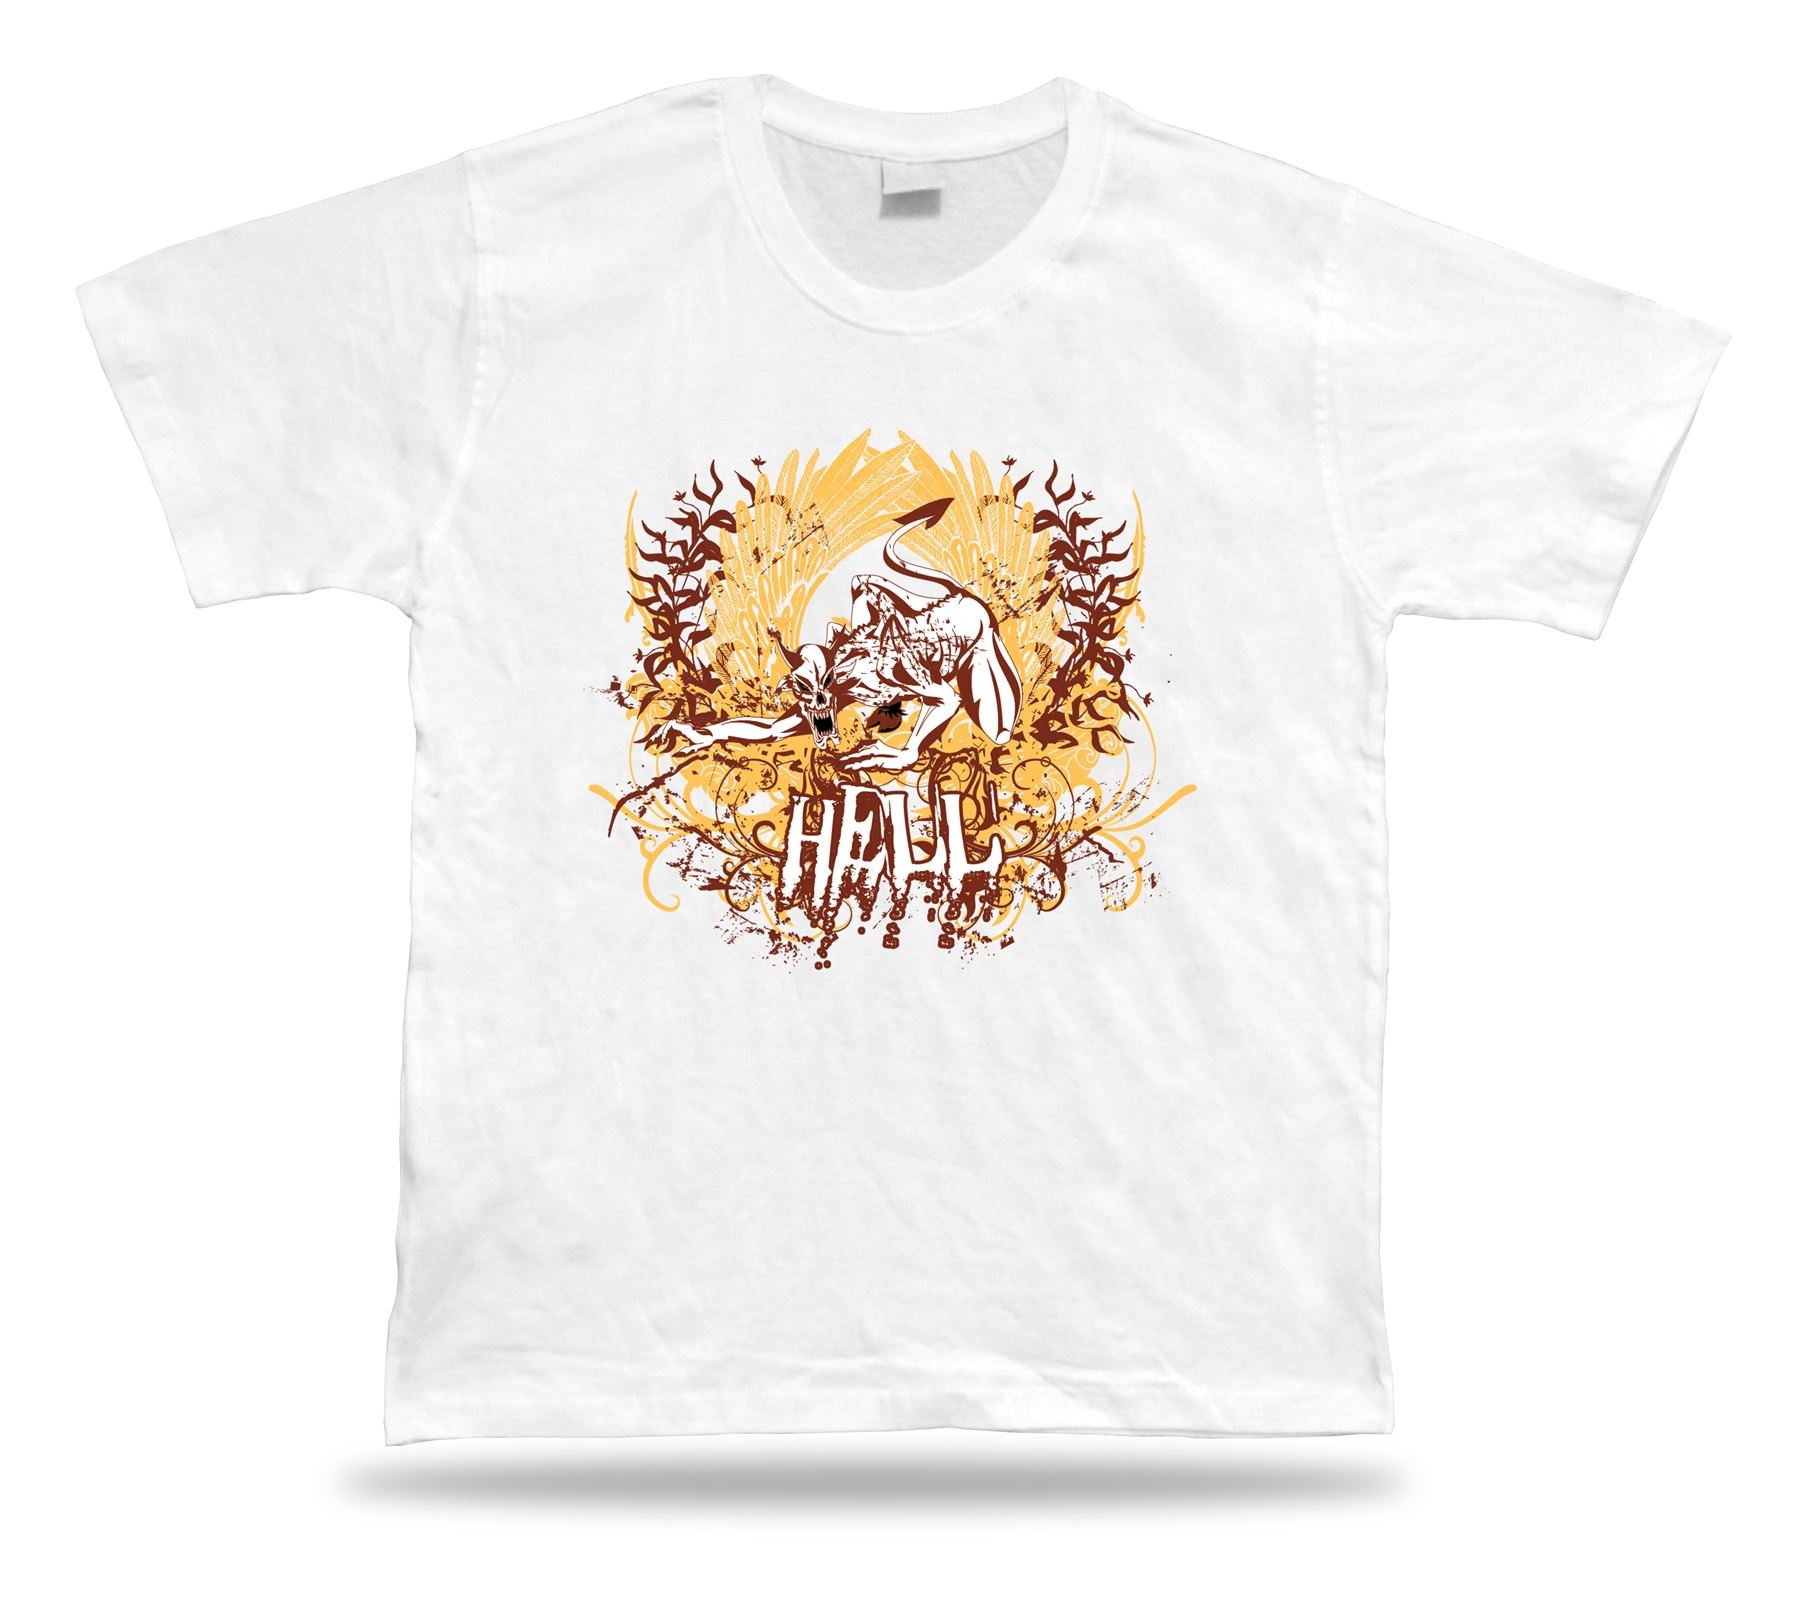 Hell Evil Demon Monster Cool Modern T Shirt Tee Desing Special ... e291ac3f8